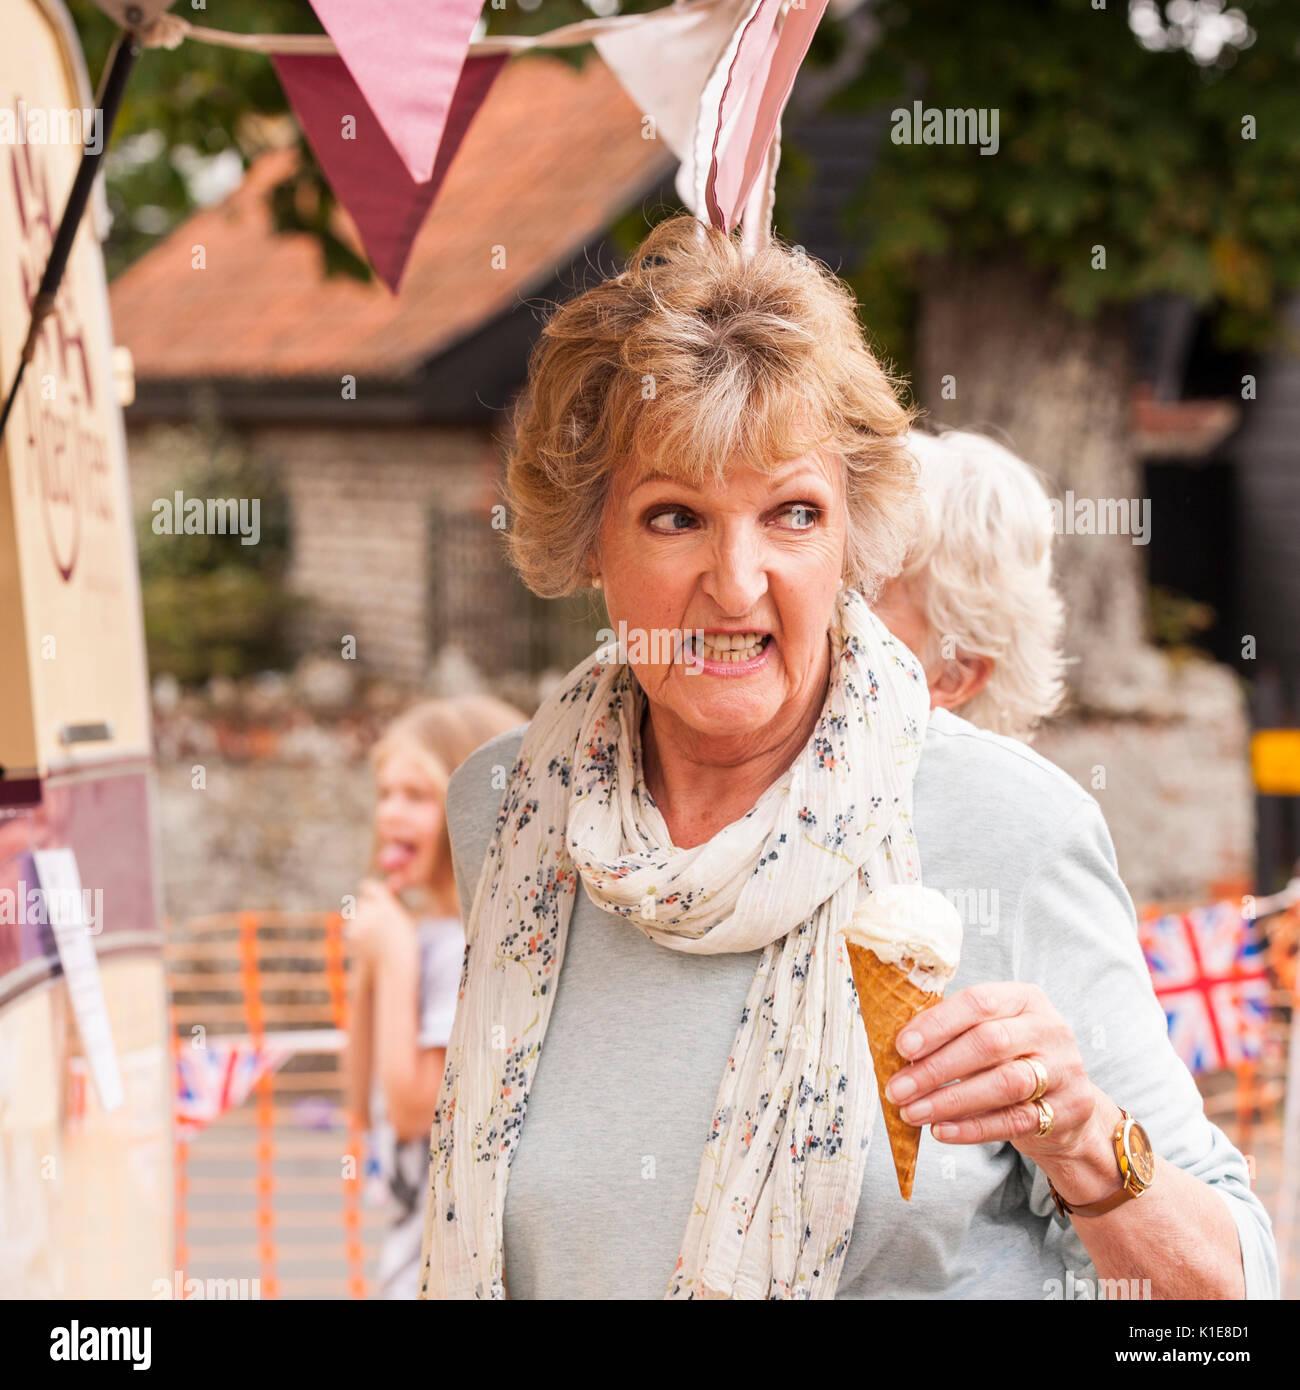 Walberswick, Suffolk, England, Uk. 26th August 2017. Penelope Keith eating an ice cream at Walberswick village fete. Tim Oram/Alamy Live News - Stock Image